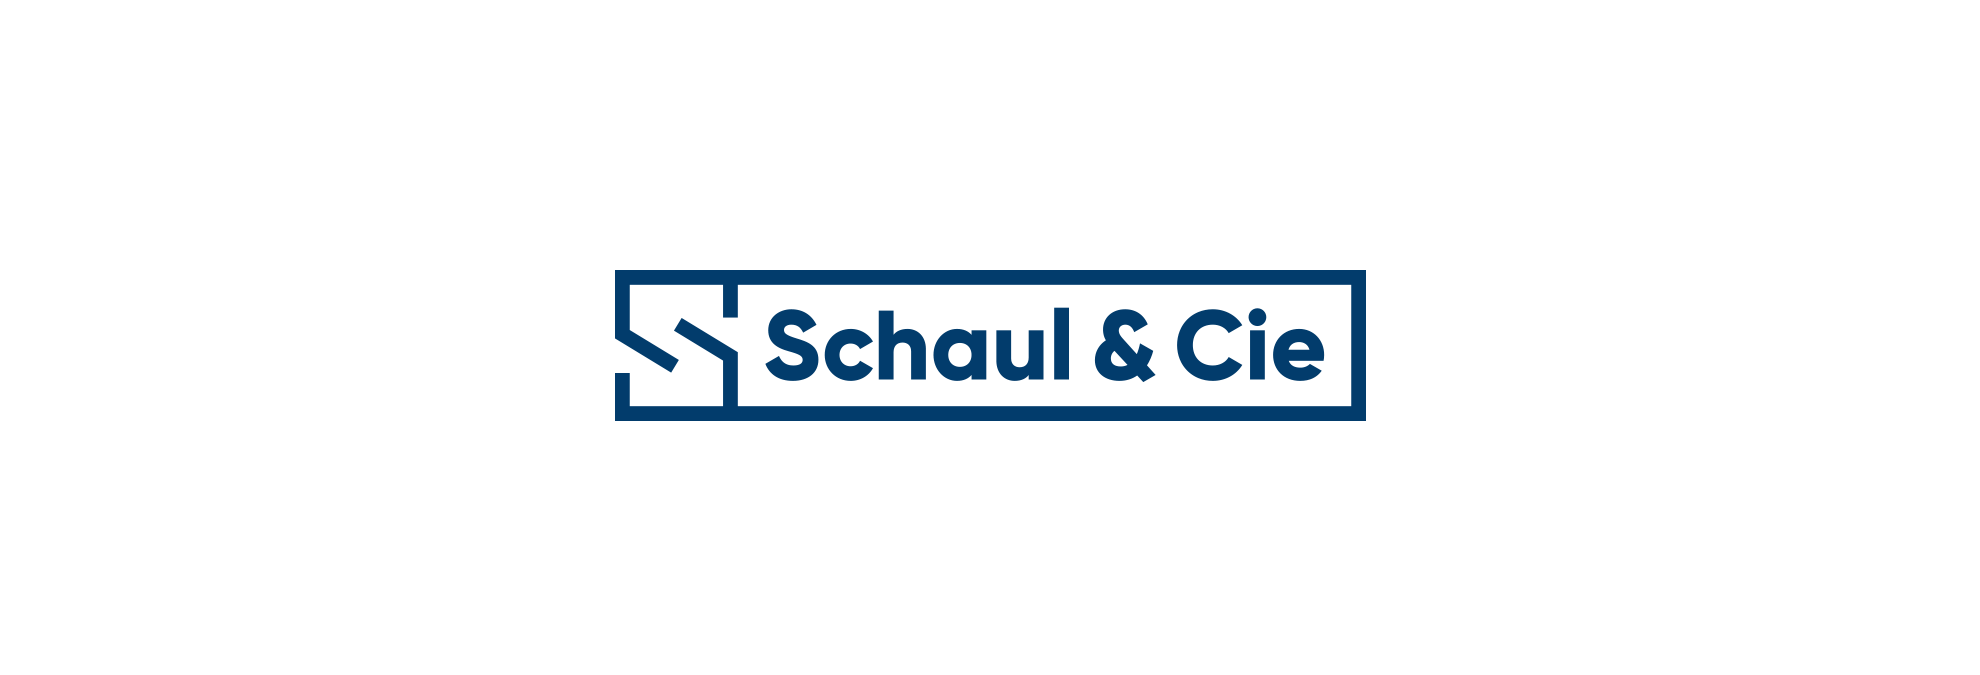 Schaul & Cie Logo - identité visuelle